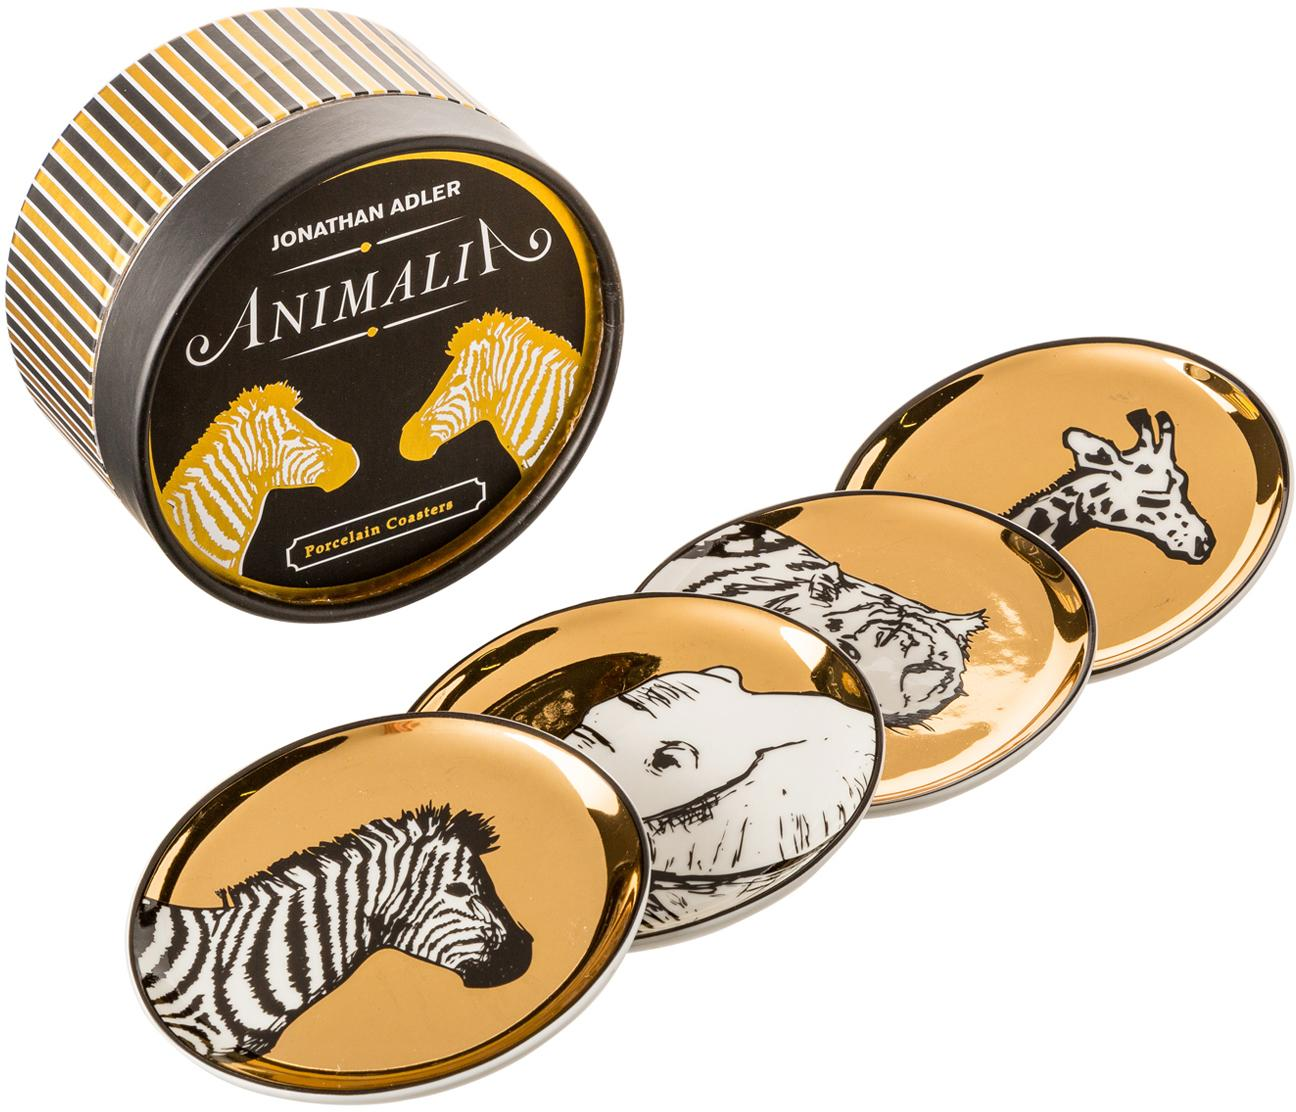 Set sottobicchieri Animalia, 4 pz., Porcellana, Oro,nero,bianco, Ø 10 cm